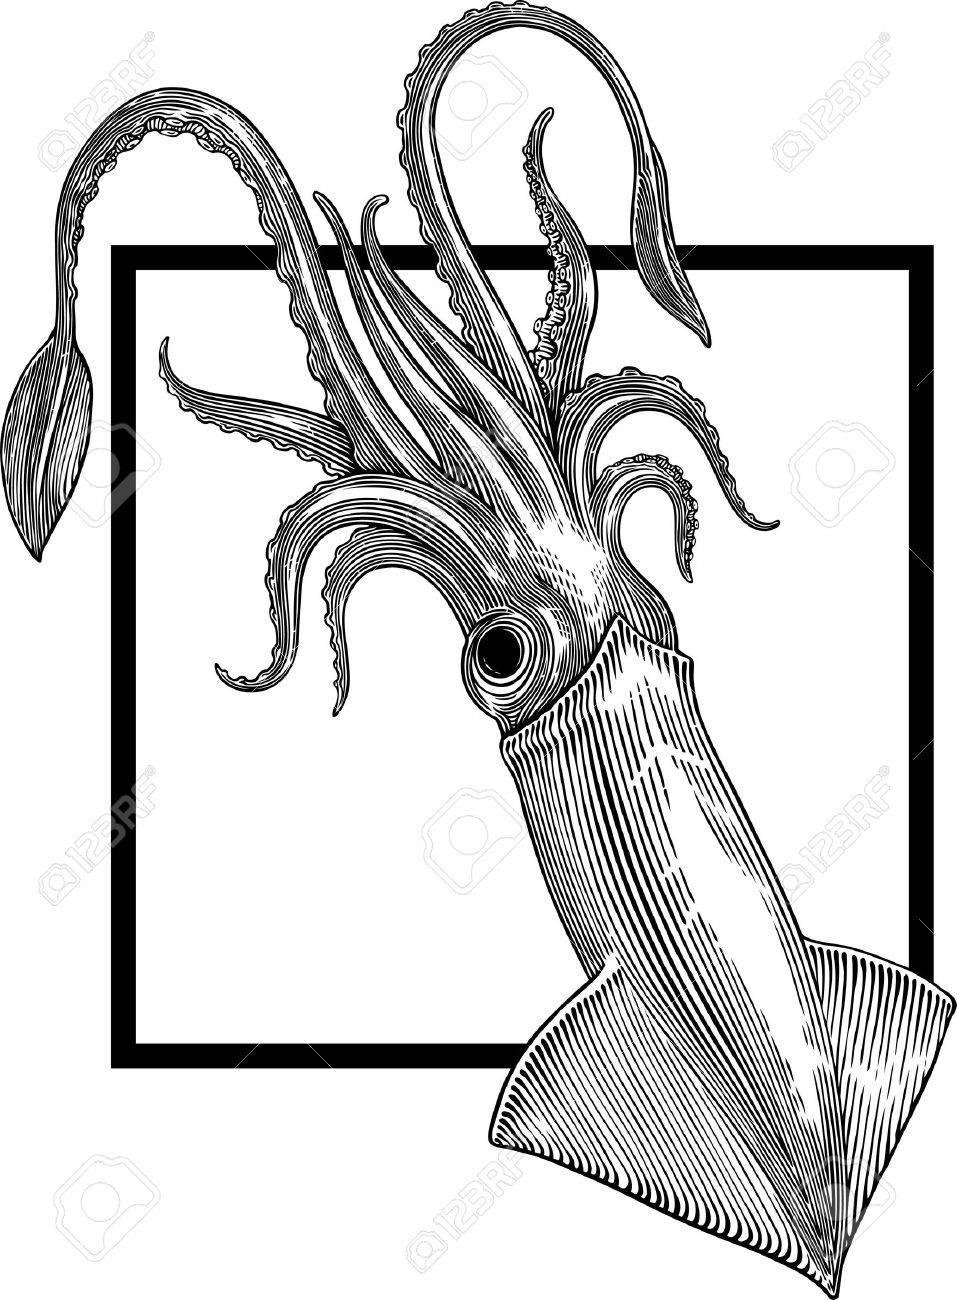 black and white illustration of squid on white background - 9527686